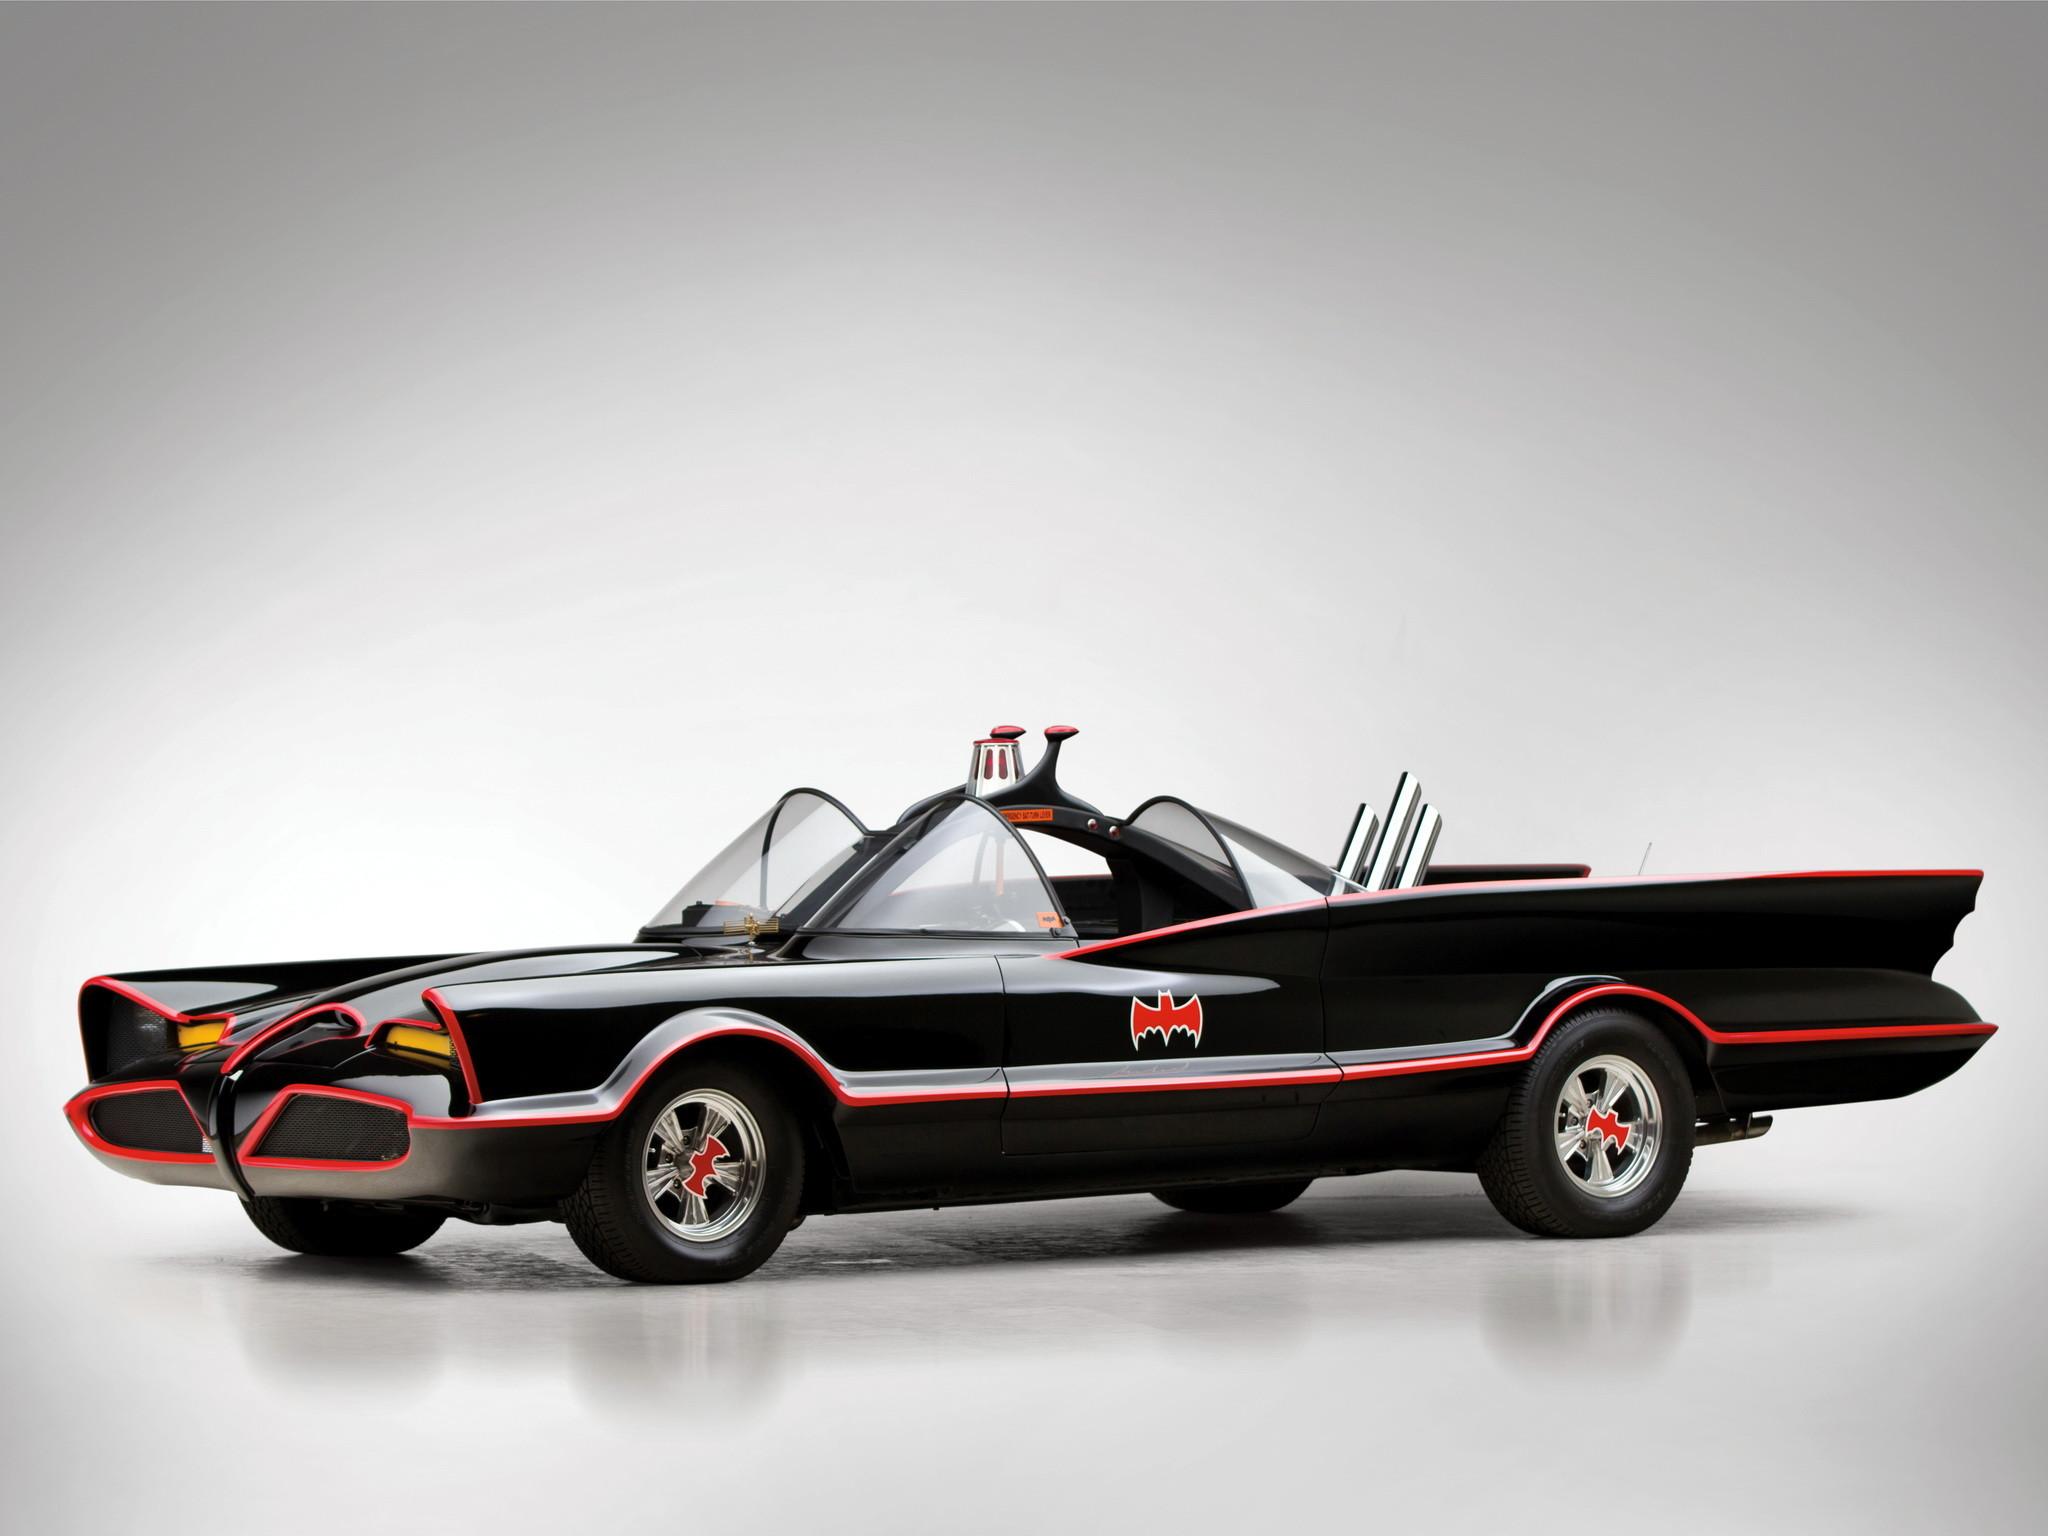 1966 Lincoln Futura Batmobile by Barris Kustom custum superhero batman .